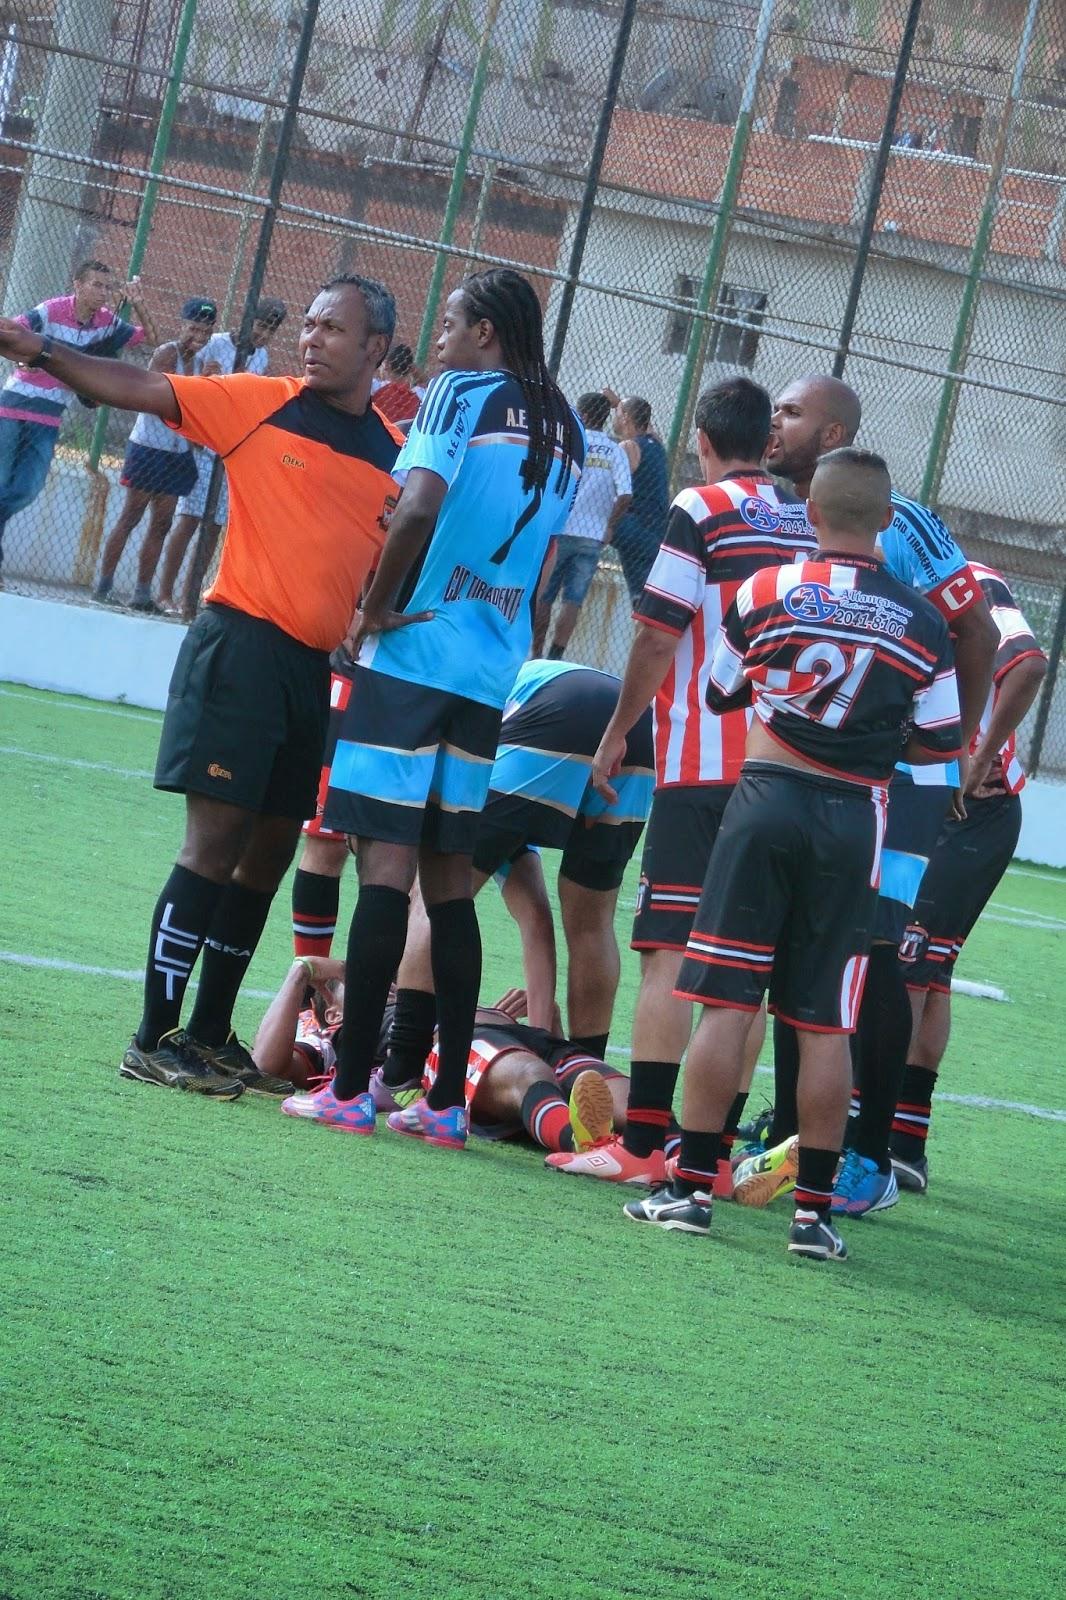 Resultados dos jogos de ida da segunda fase da Copa Libertadores da Várzea